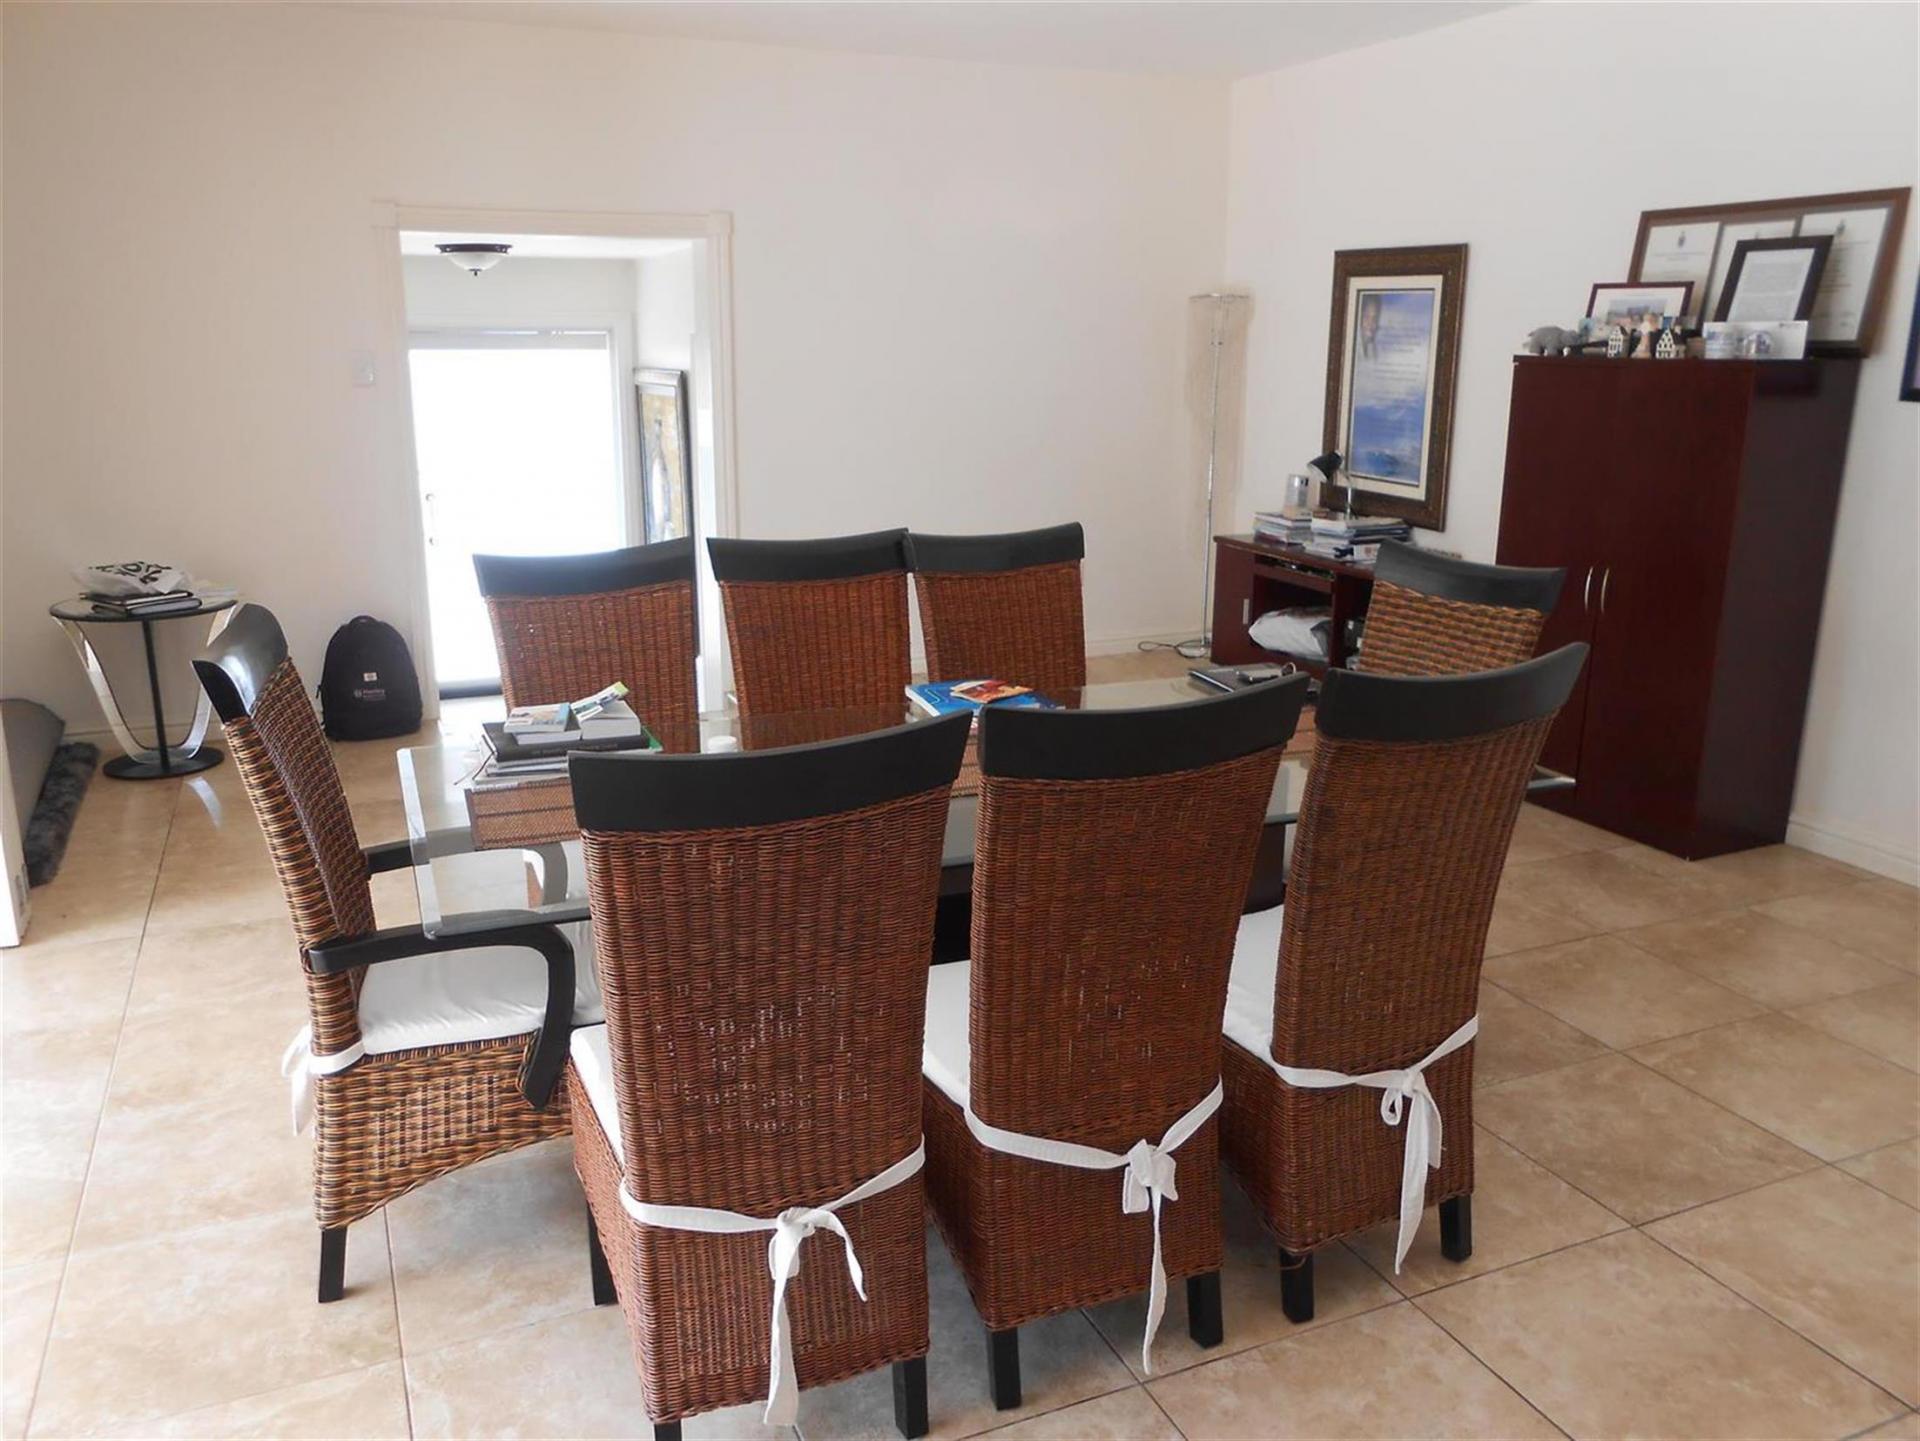 Dining Room Of Property In Pietermaritzburg KZN